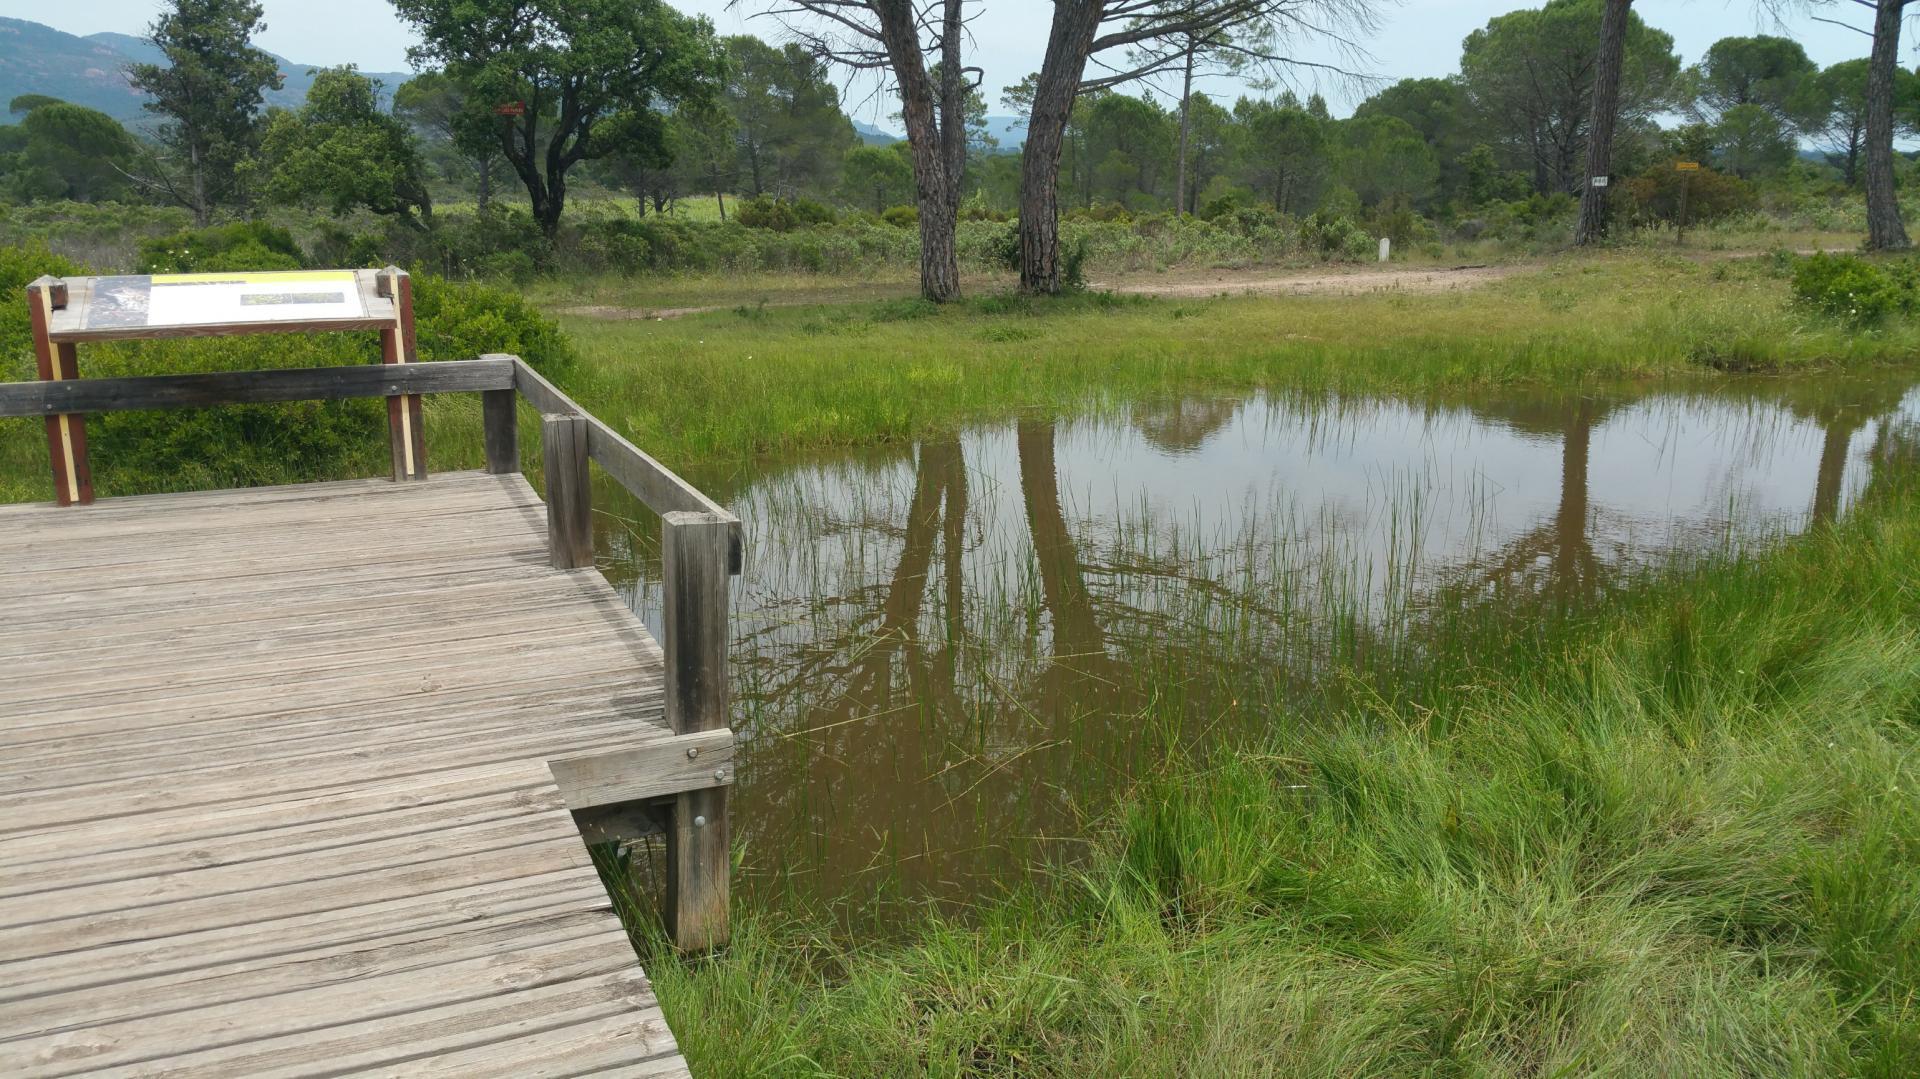 Lac de l endre et de la mirade golf saint andreol gites du moulin de callas var 6 2